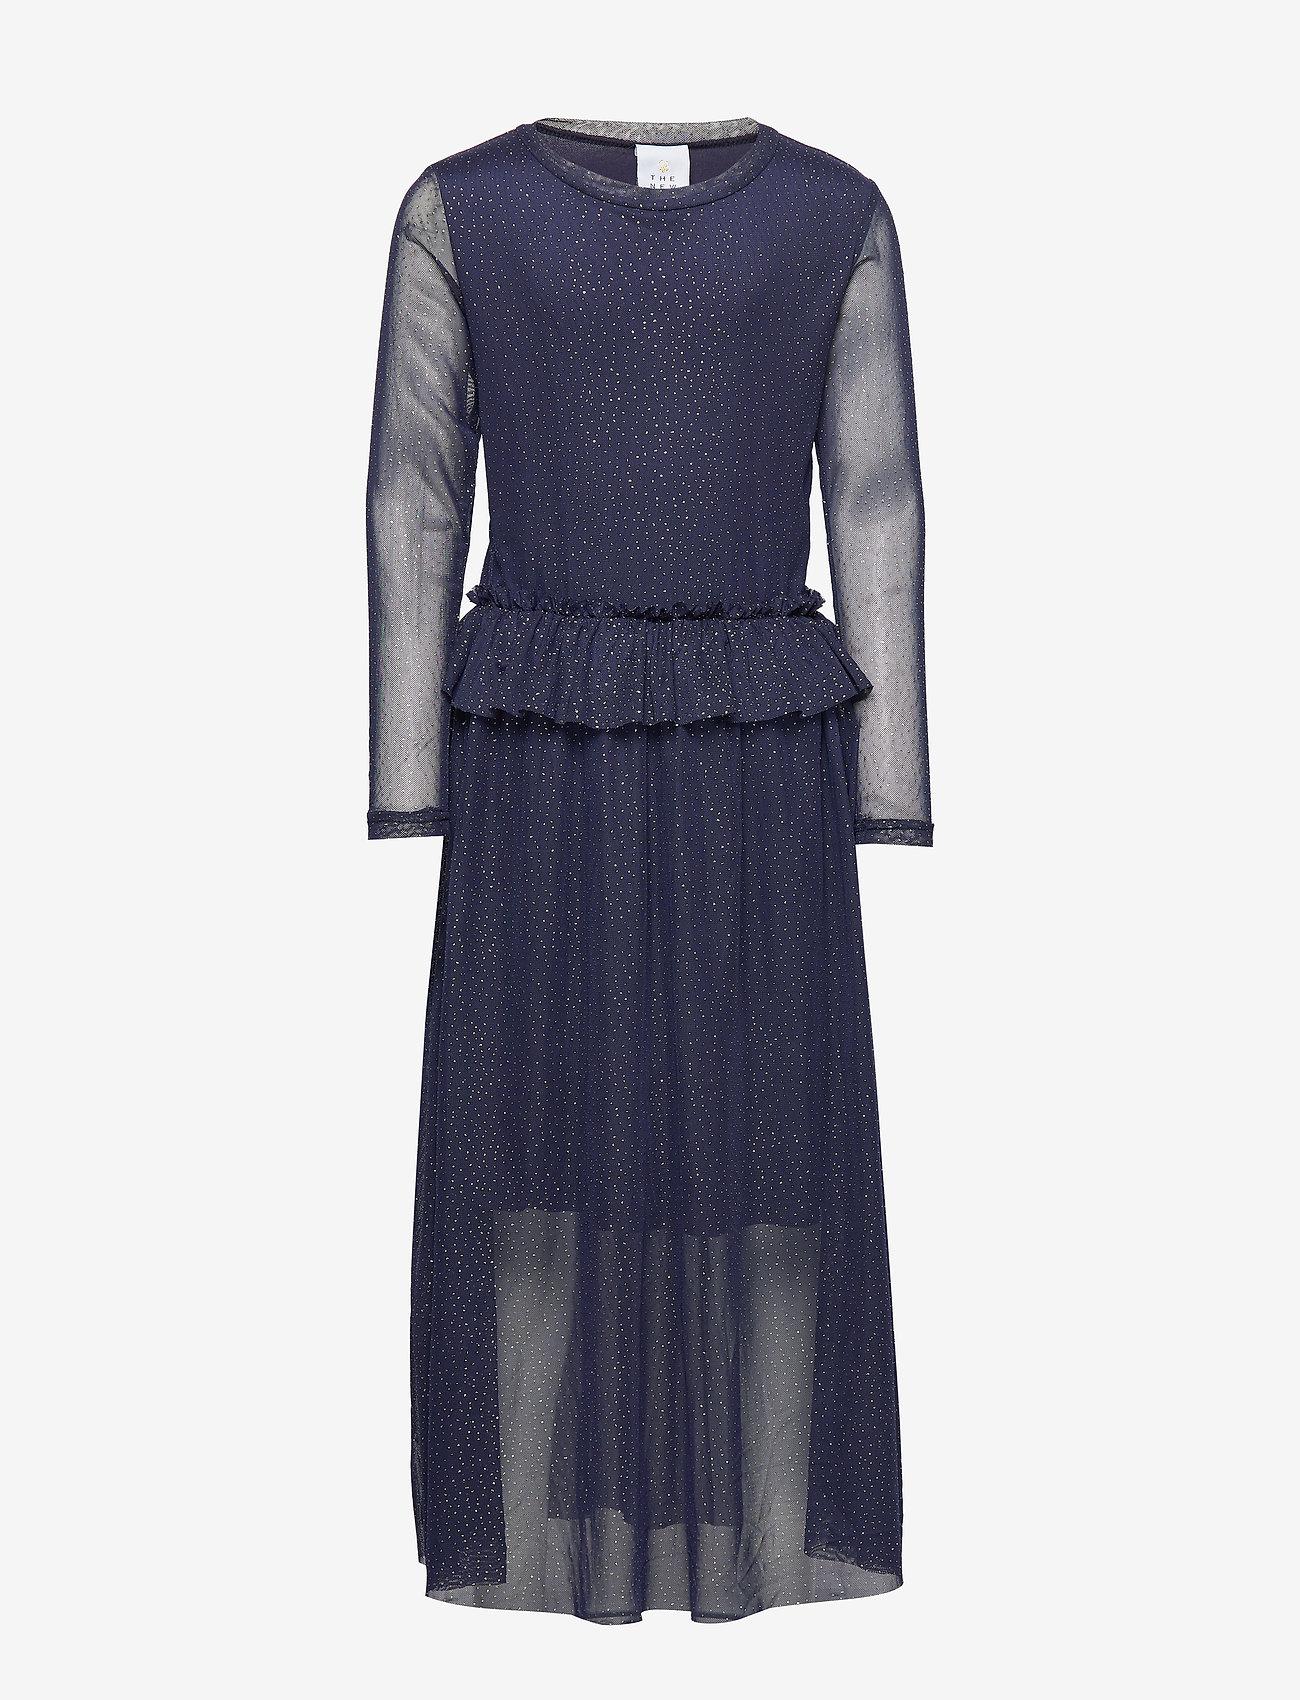 The New - ODESSA L_S DRESS COL BLACK IRIS - kleider - black iris - 0